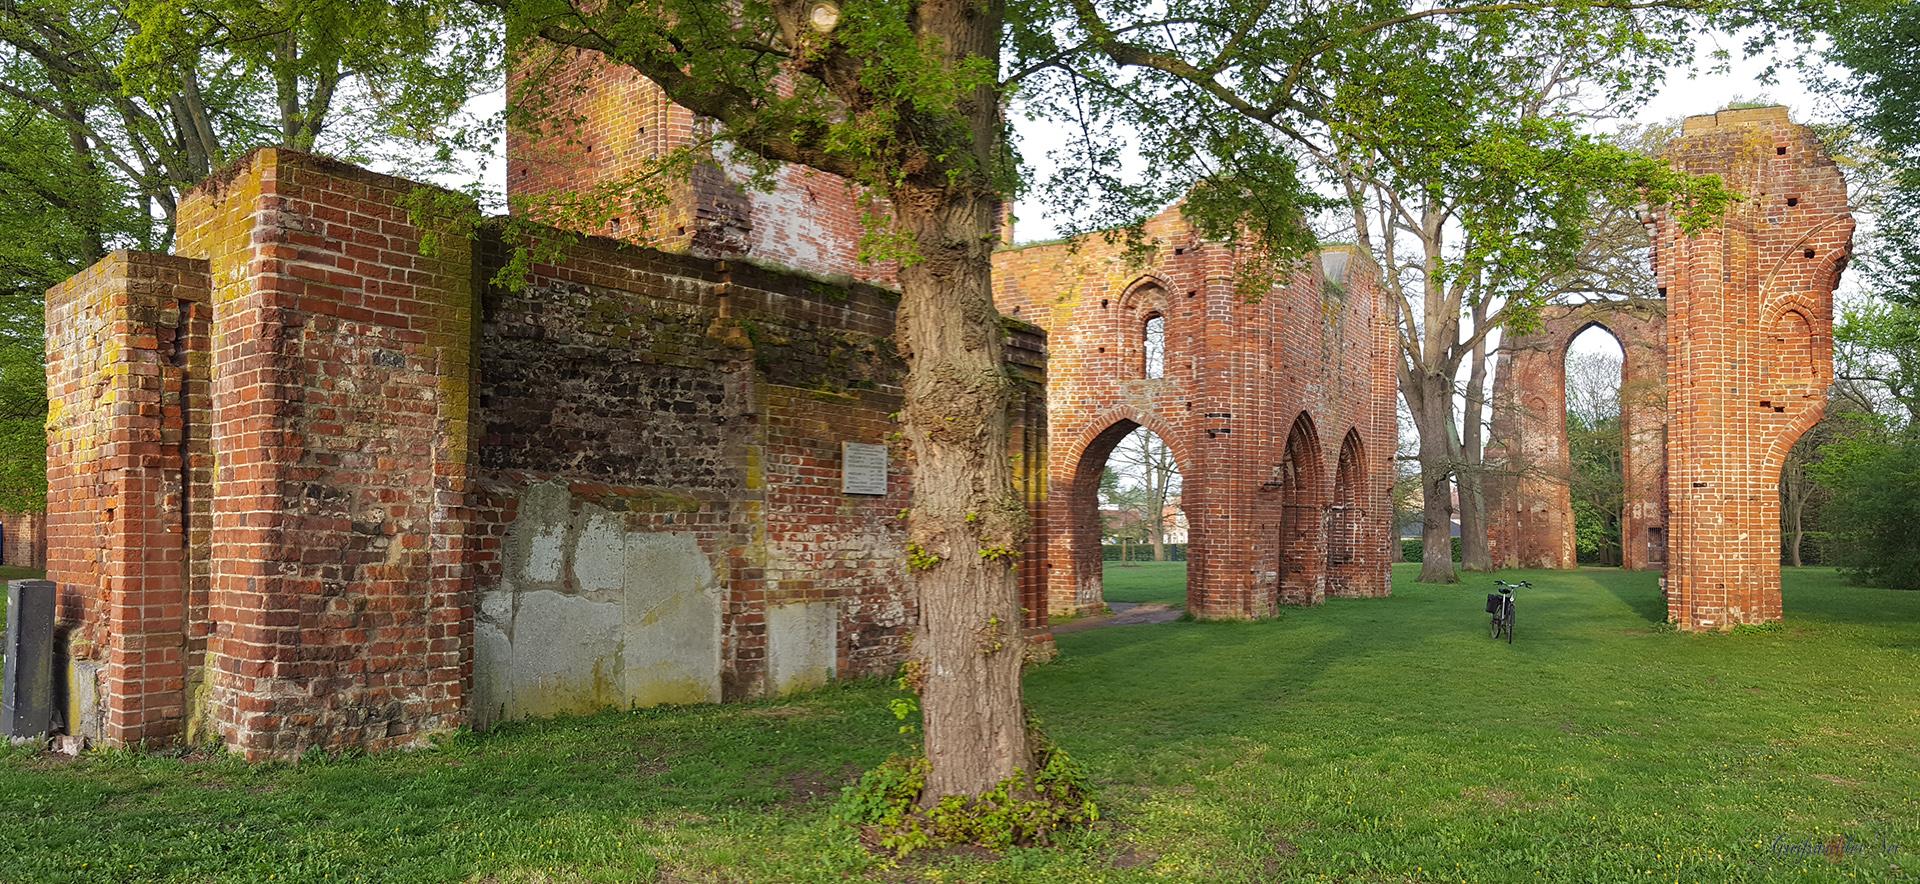 Klosterruine Greifswald-Eldena